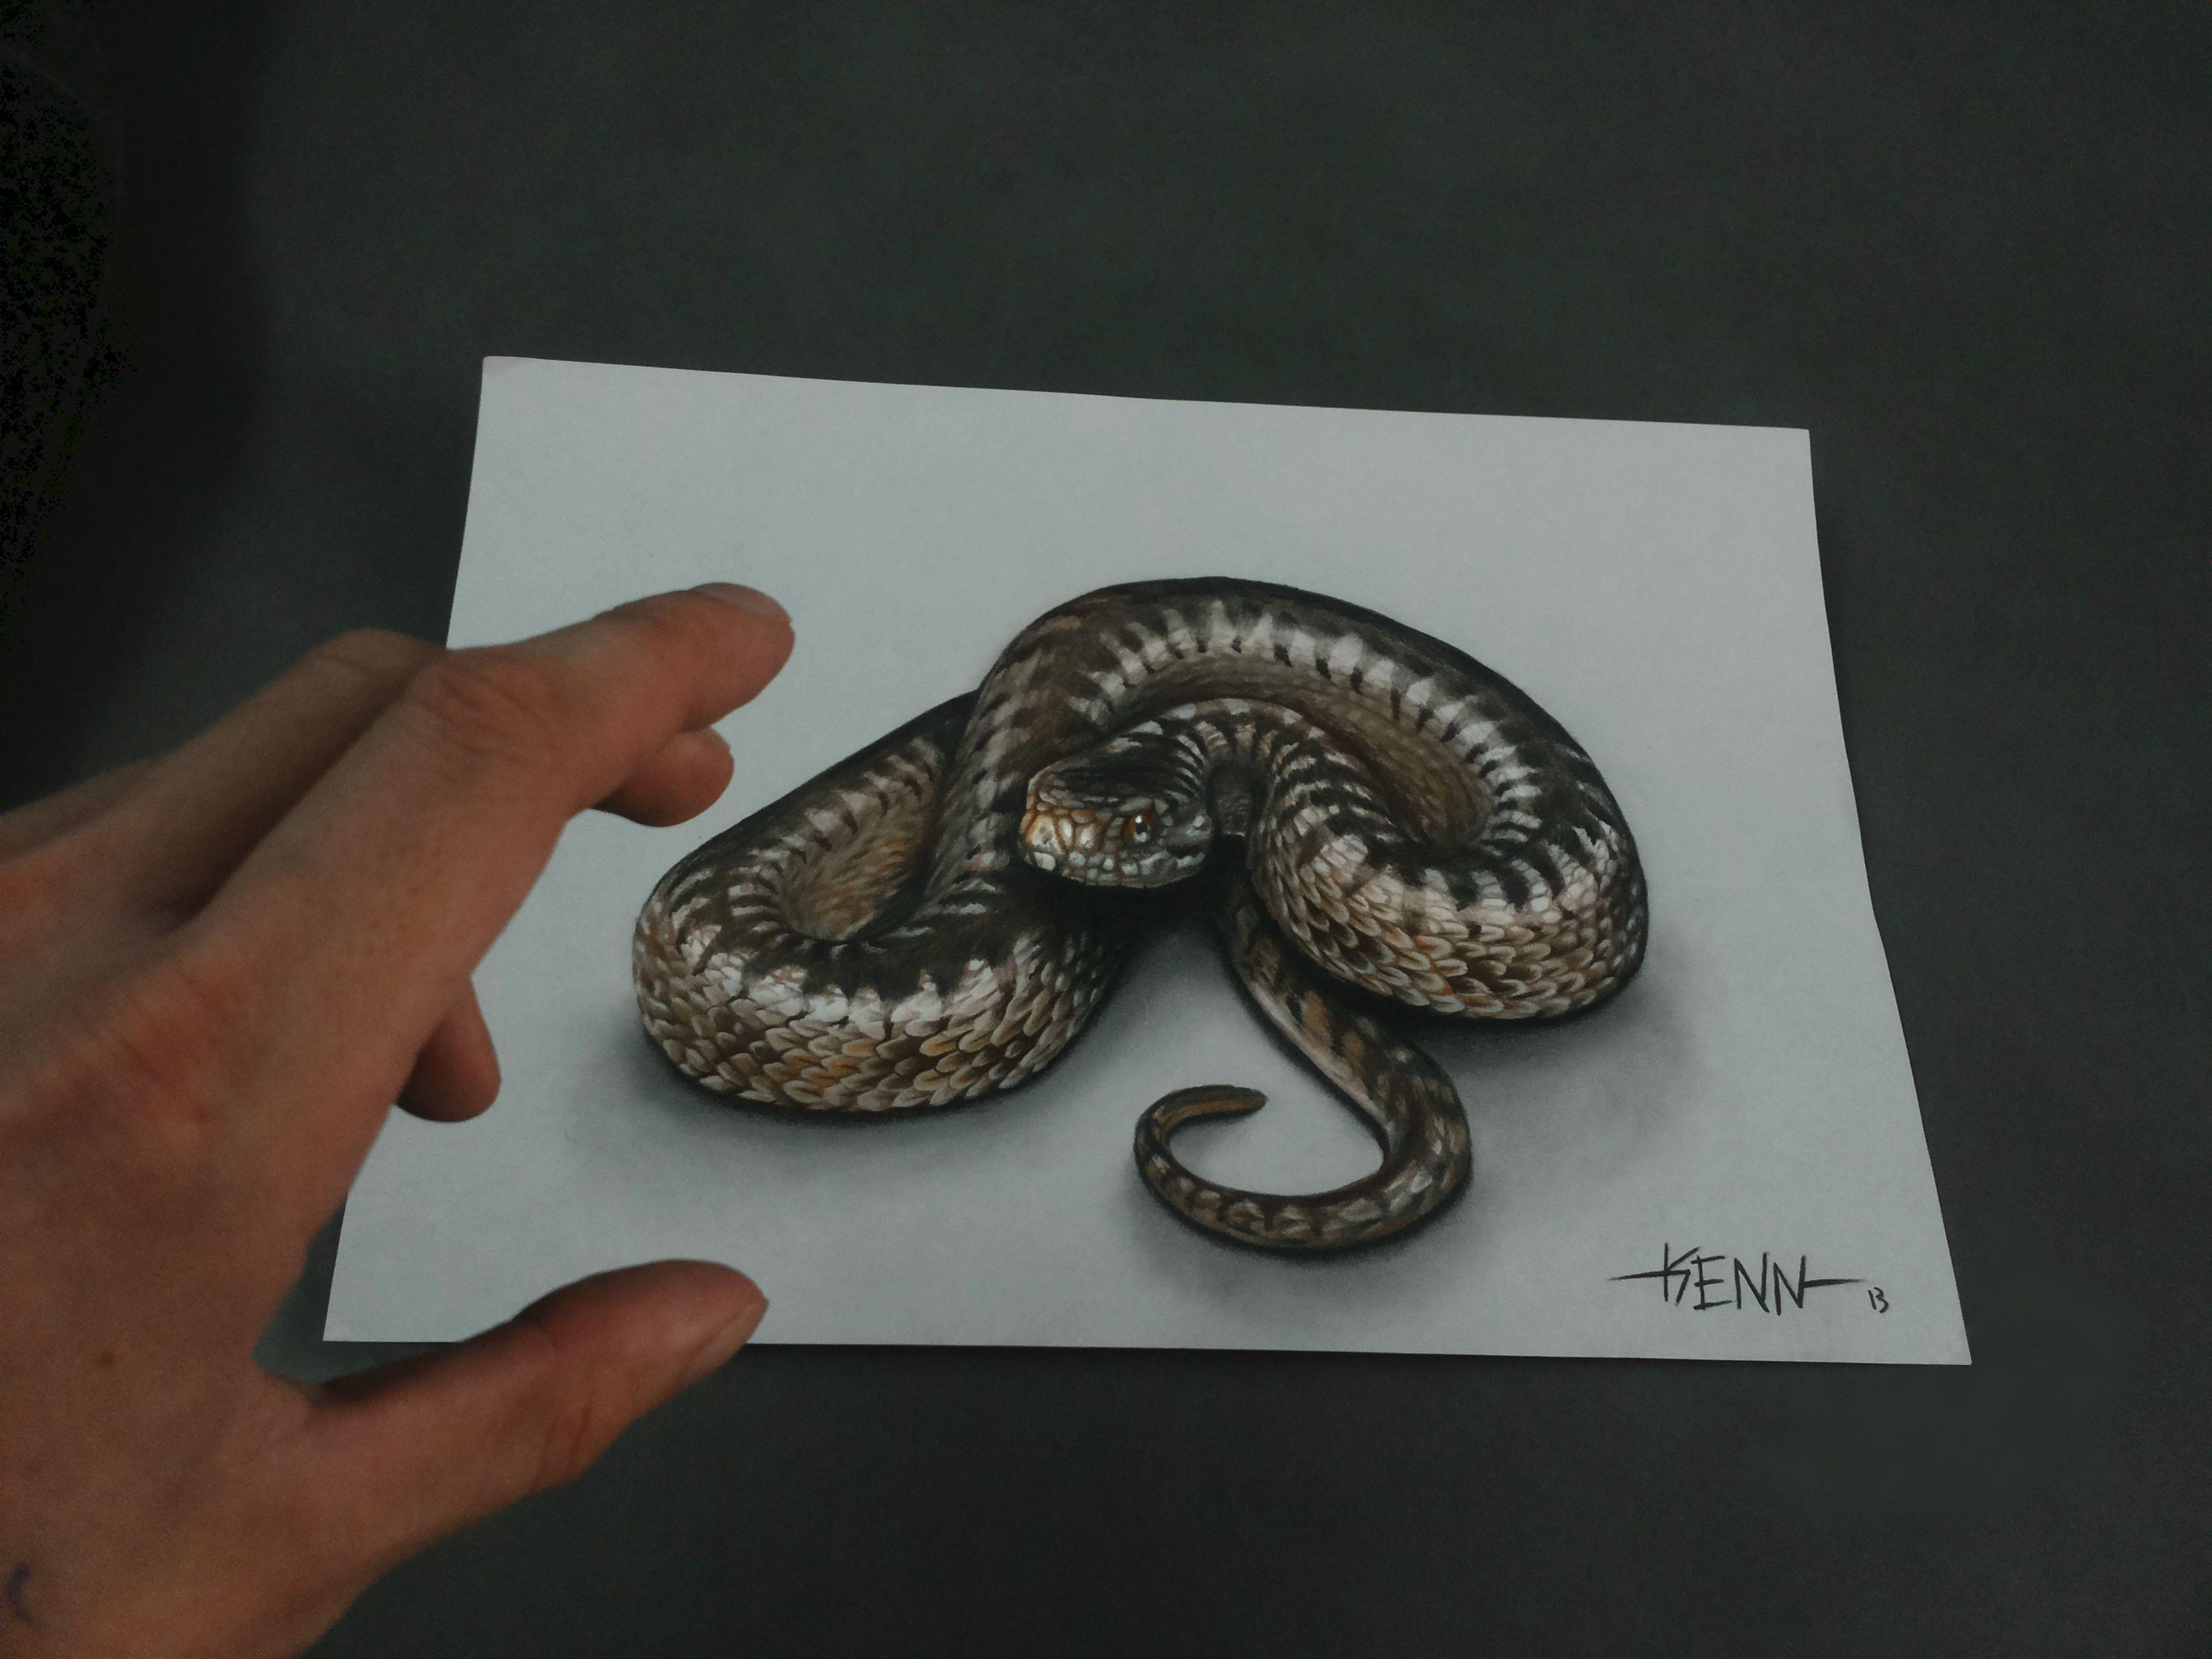 3D snake - Kenn Skogli...